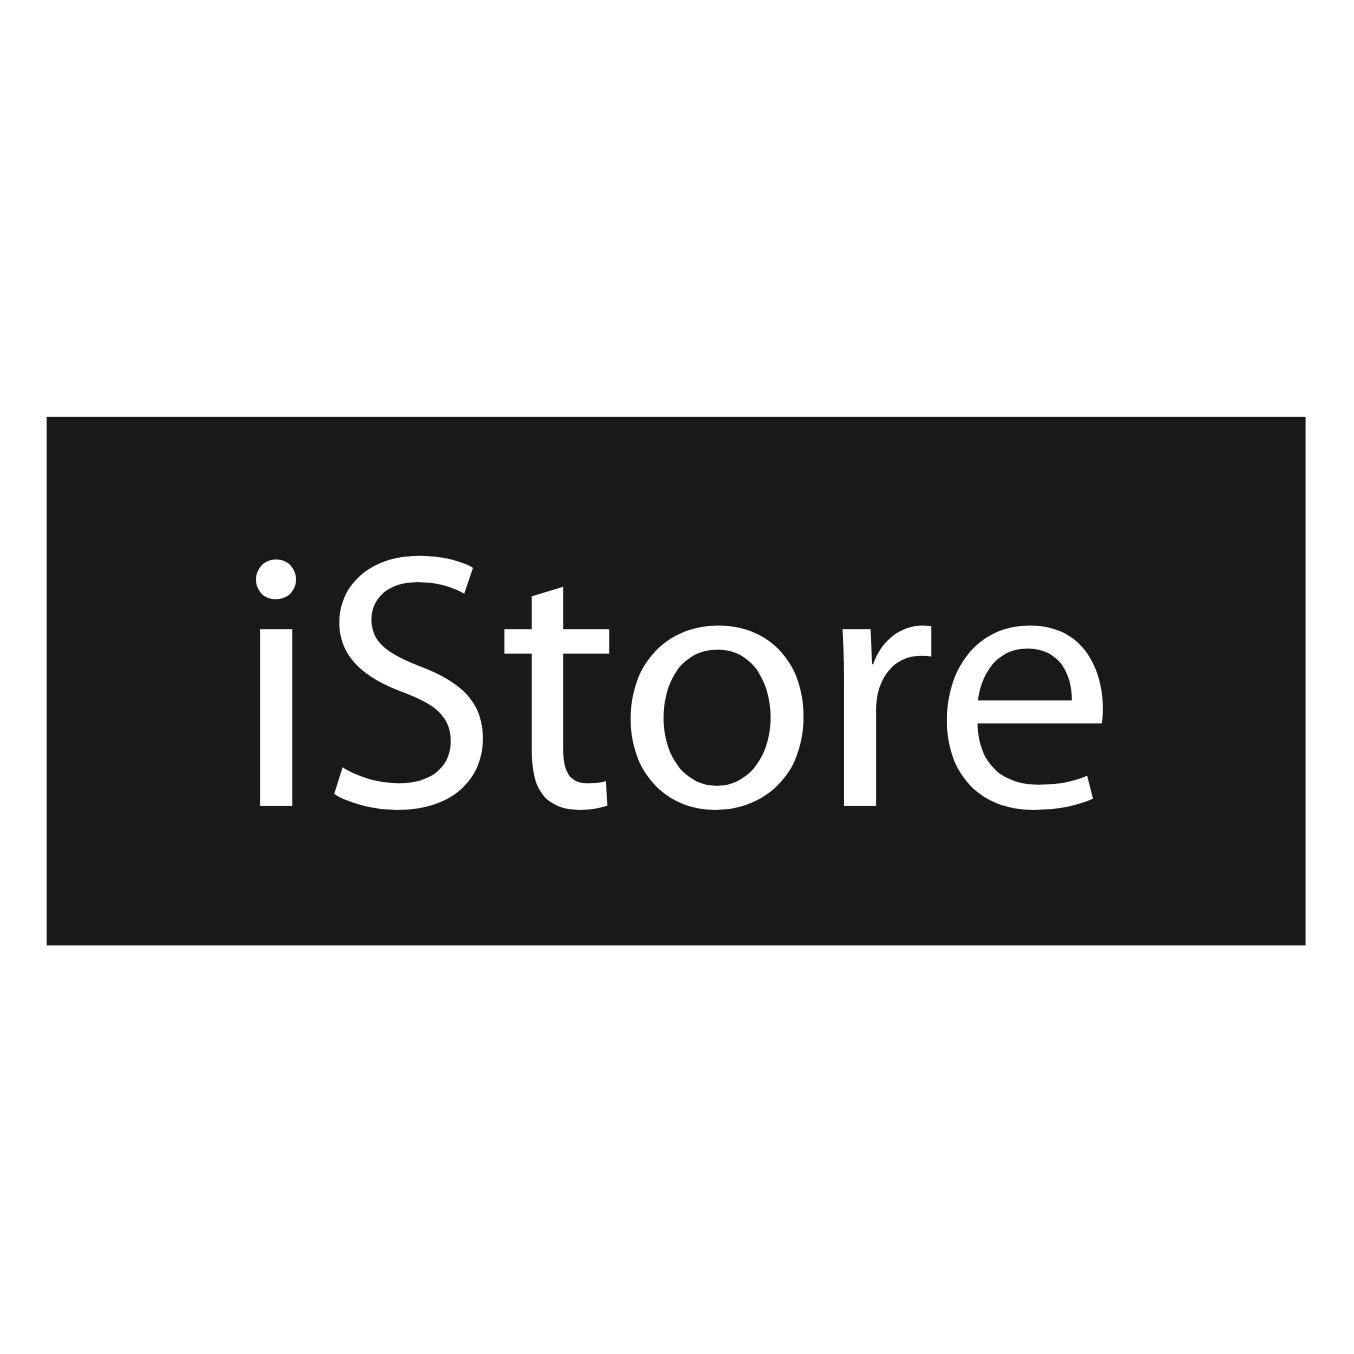 13-inch MacBook Pro   Apple M1 chip 16GB Ram   256GB - Space Grey